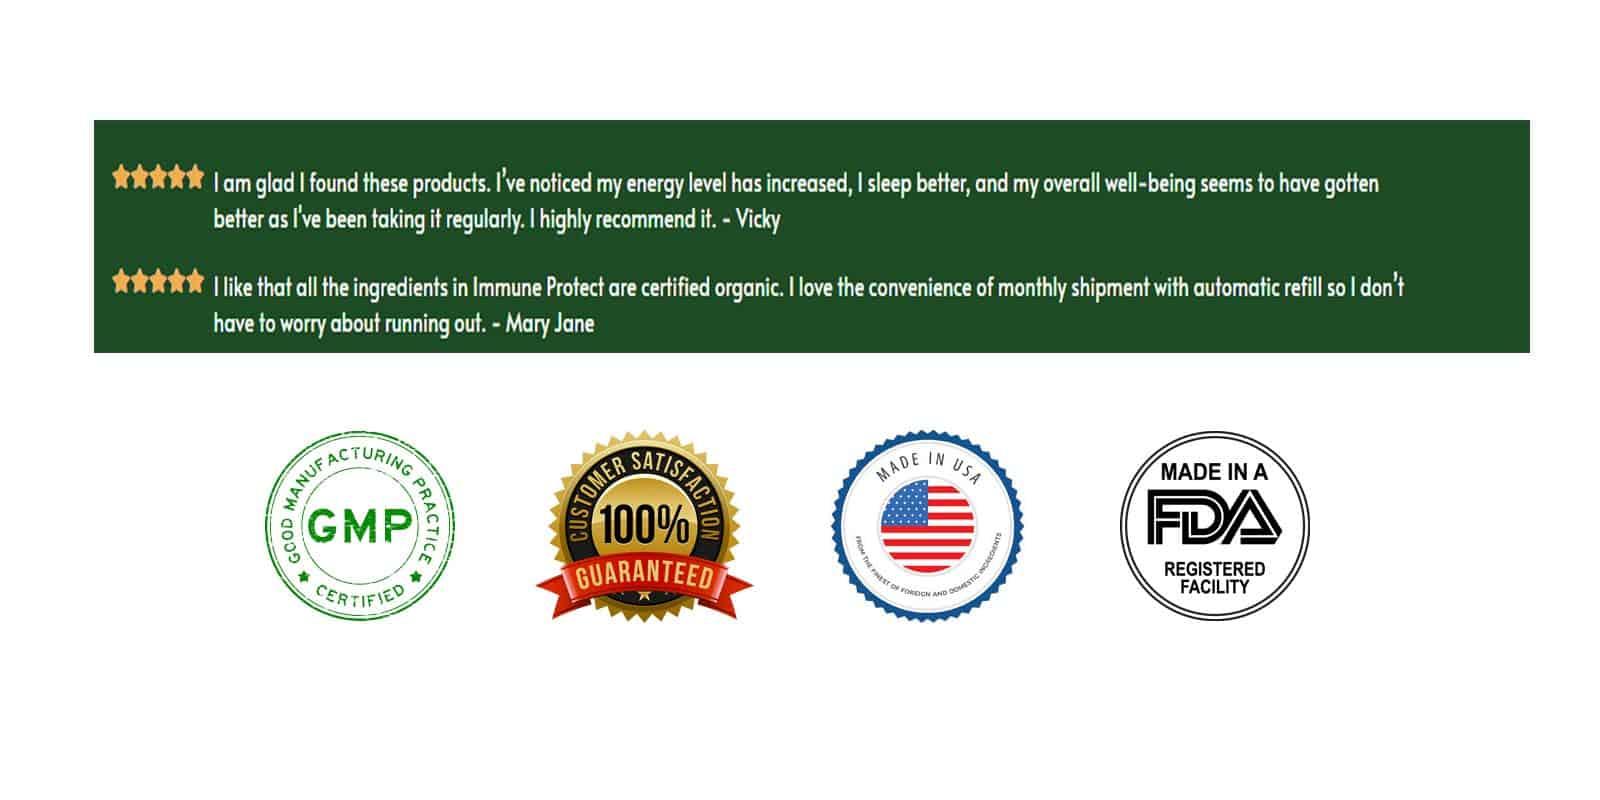 Immune Protect Customer reviews